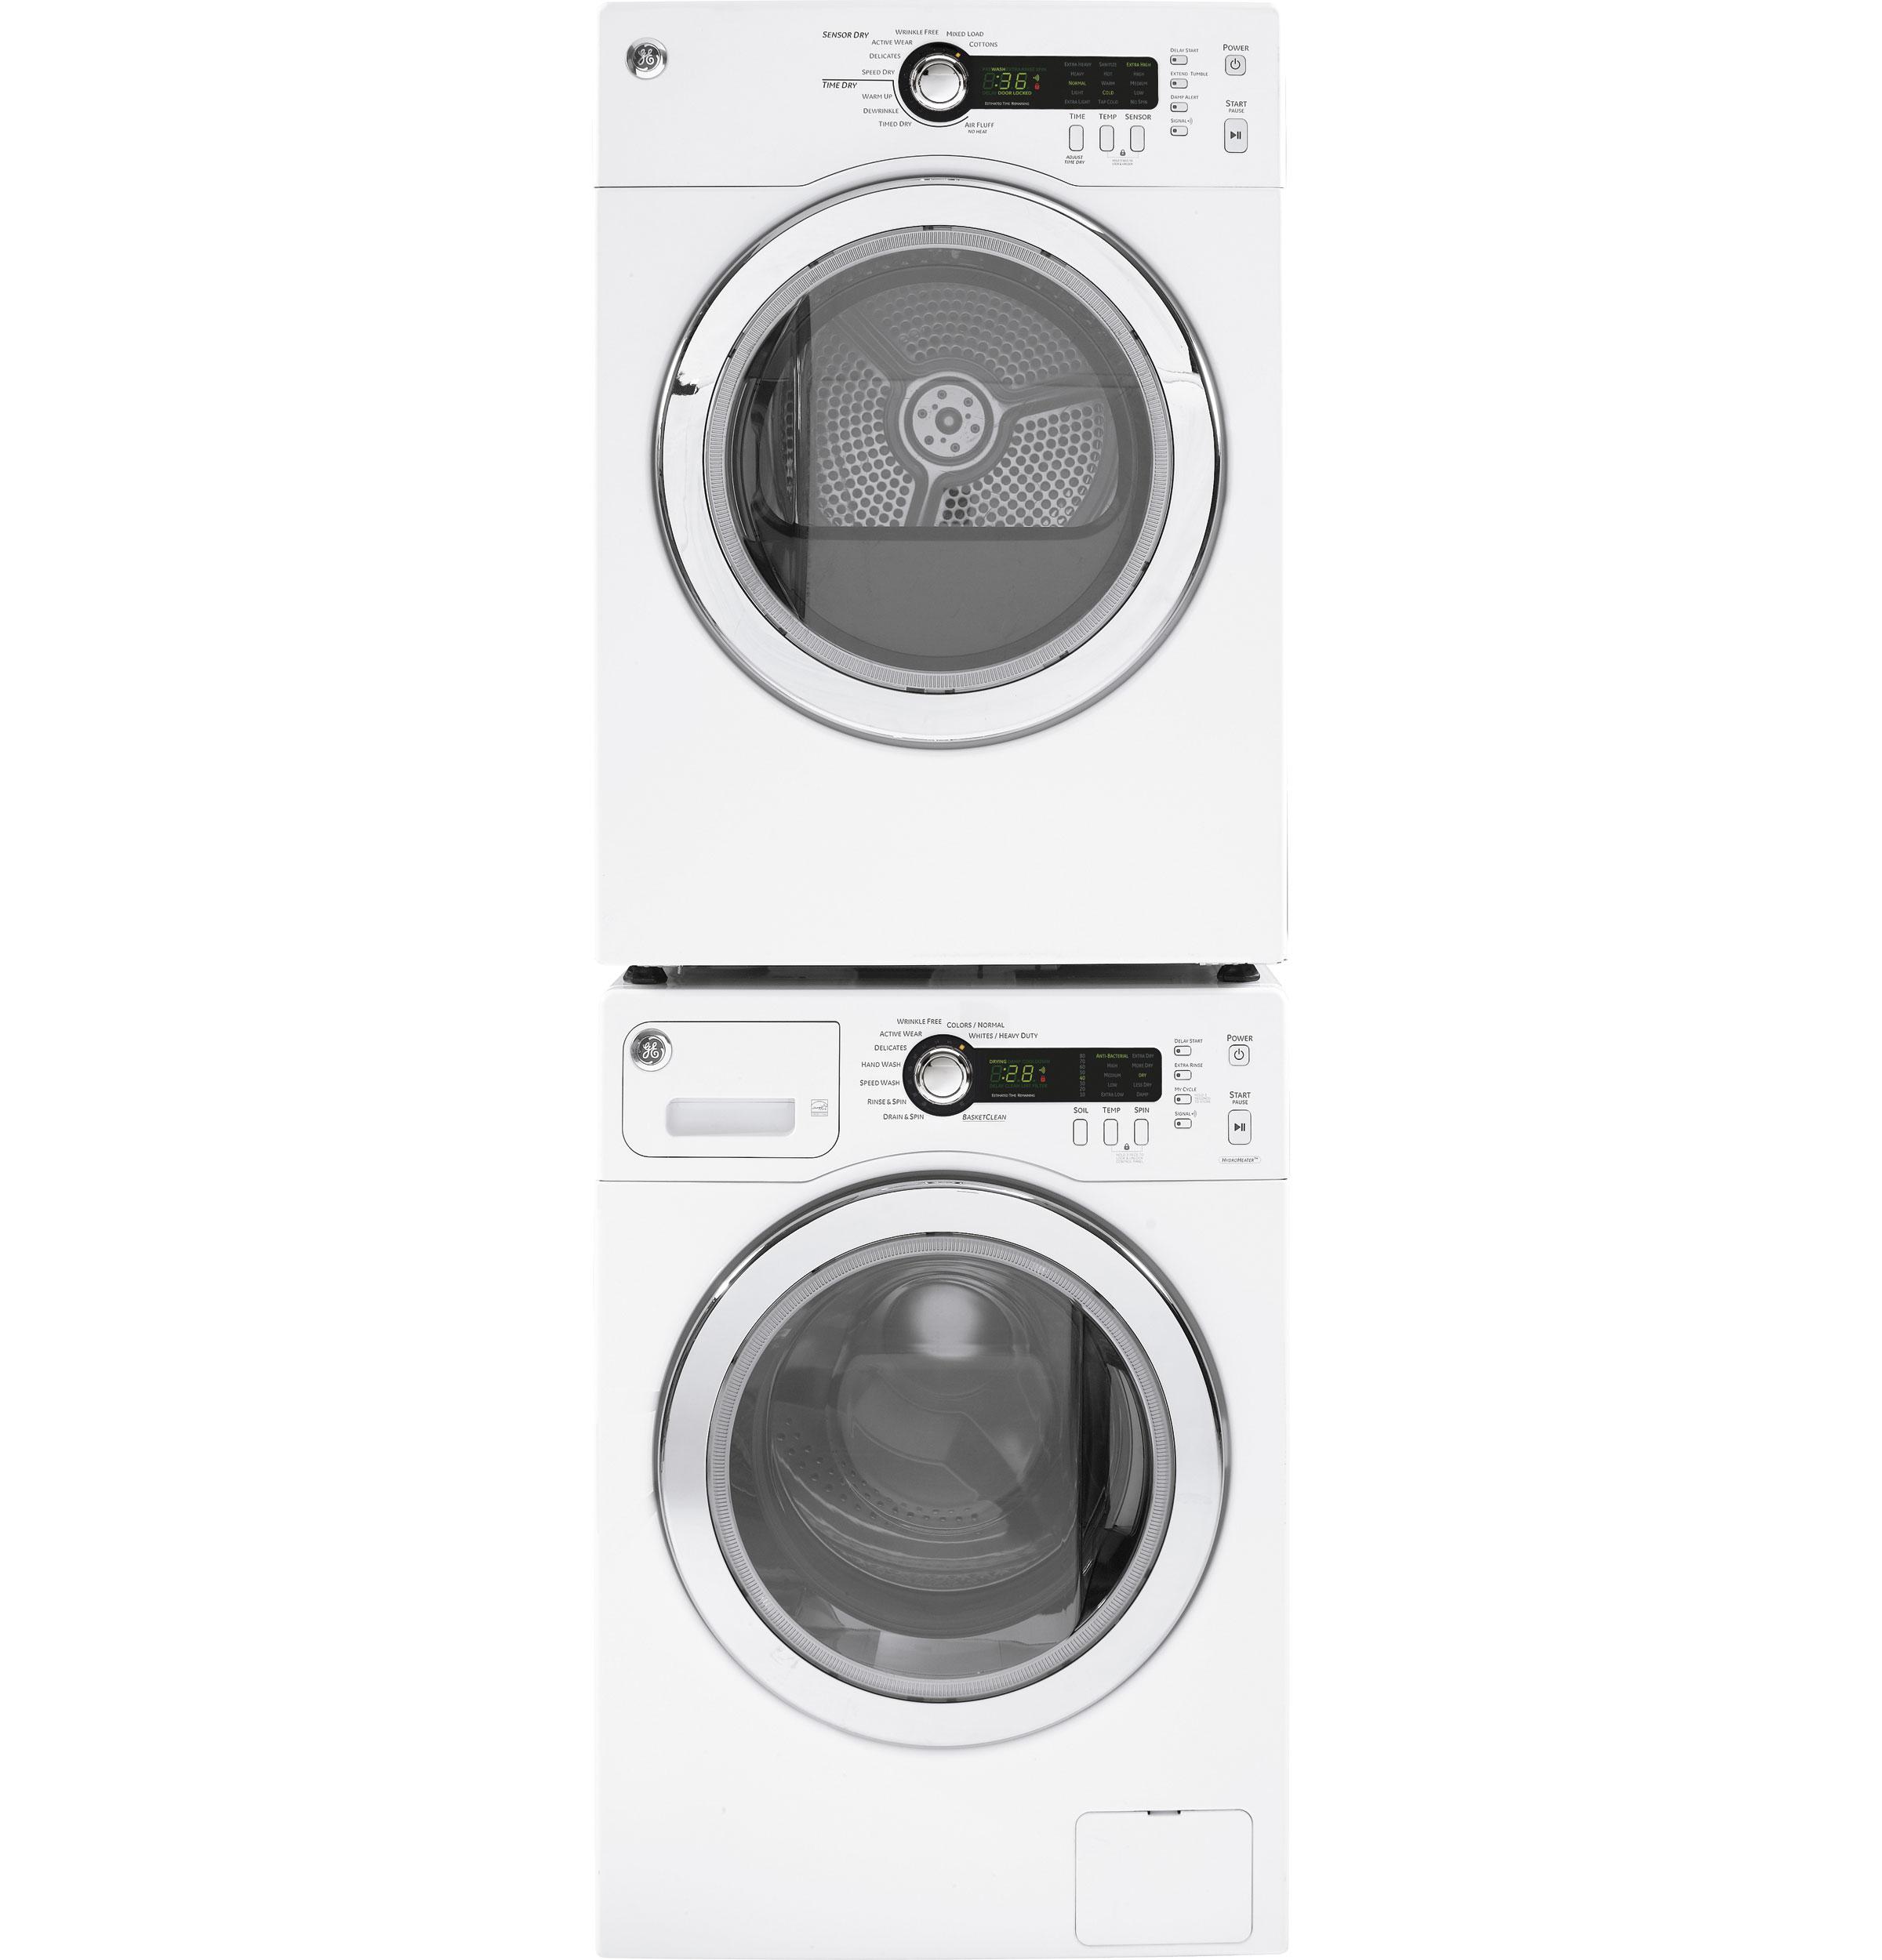 [SCHEMATICS_4NL]  AF_8777] Wiring Diagram Ge Stackable Washer Dryer Wiring Circuit Diagrams  Download Diagram   Wiring Diagram Ge Profile Washing Machine      Hutpa Phot Boapu Mohammedshrine Librar Wiring 101